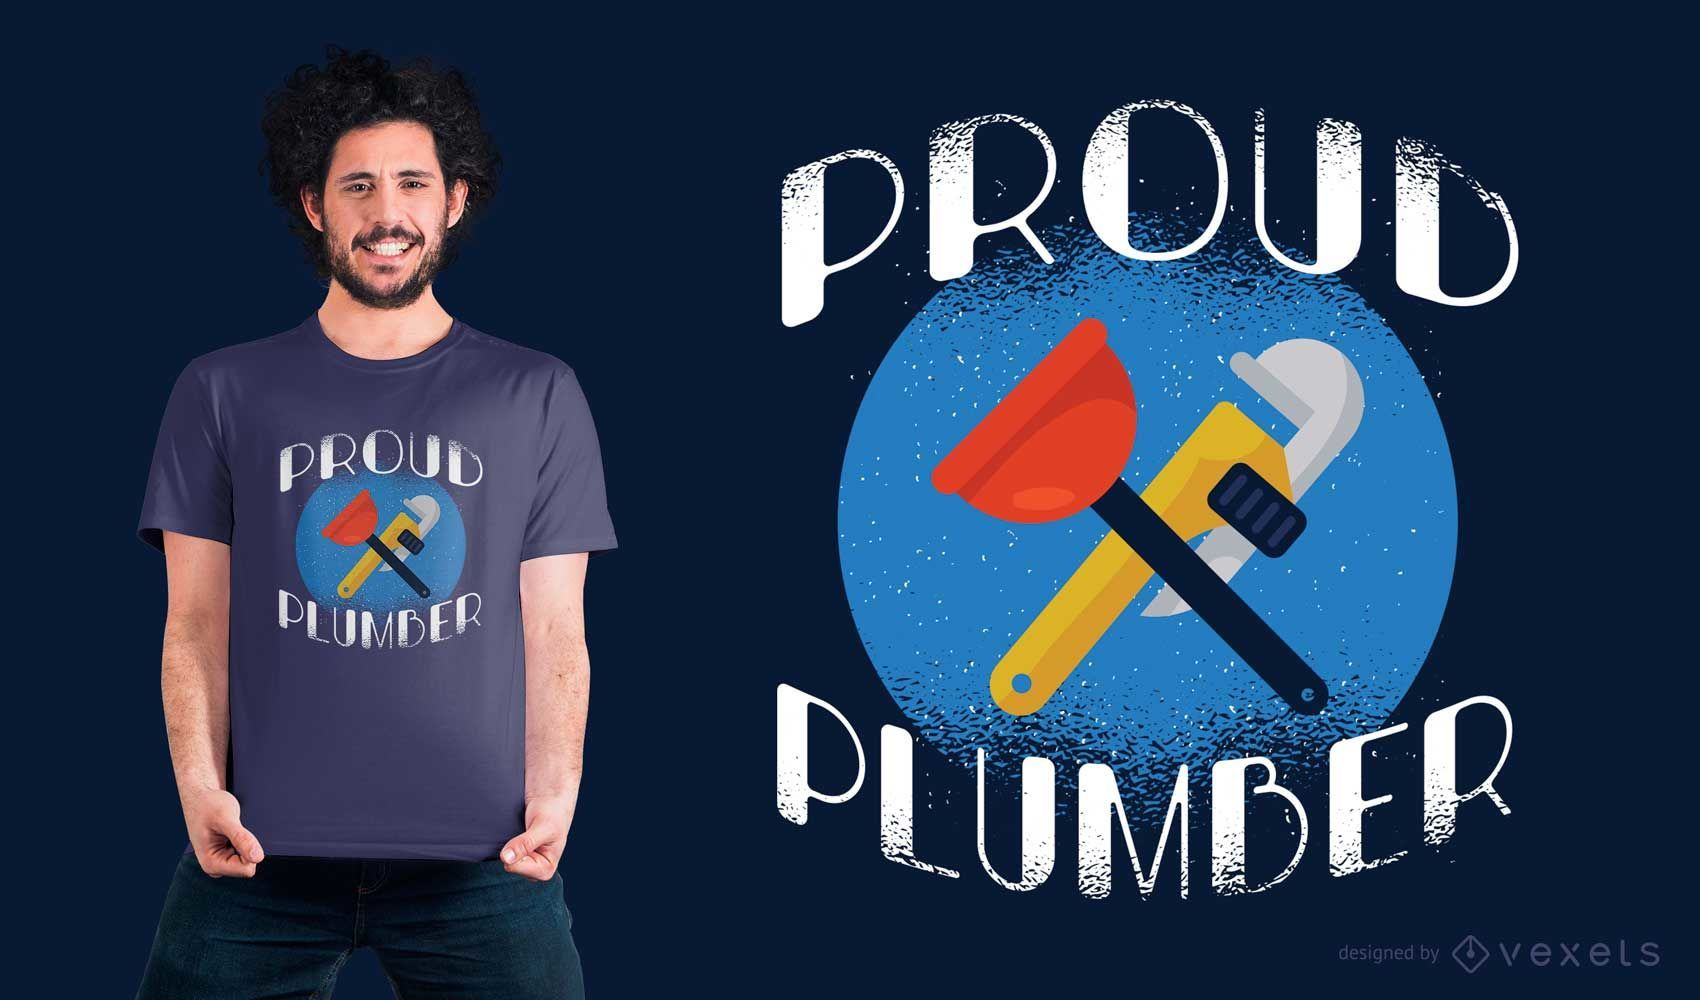 Proud Plumber T-Shirt Design